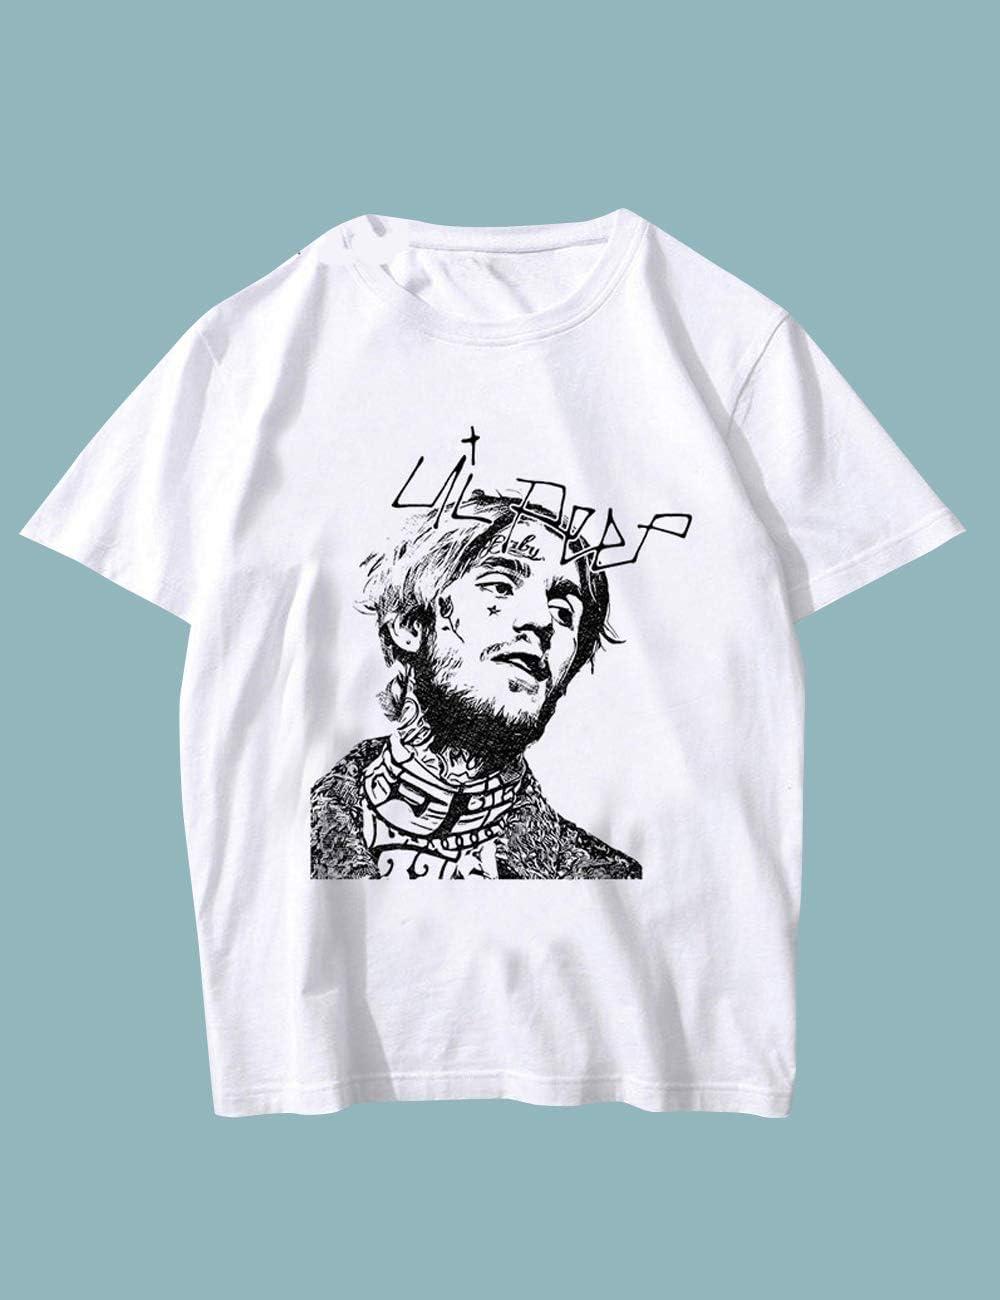 KIACIYA Lil Peep Tshirt Herren Damen Hellboy Cry Baby Love 3D Druck Shirt Unisex Frauen M/änner Sommer T-Shirts Teenager M/ädchen Kinder Casual Kurzarm Tshirts Sport Blusen Shirt Oberteile Tops